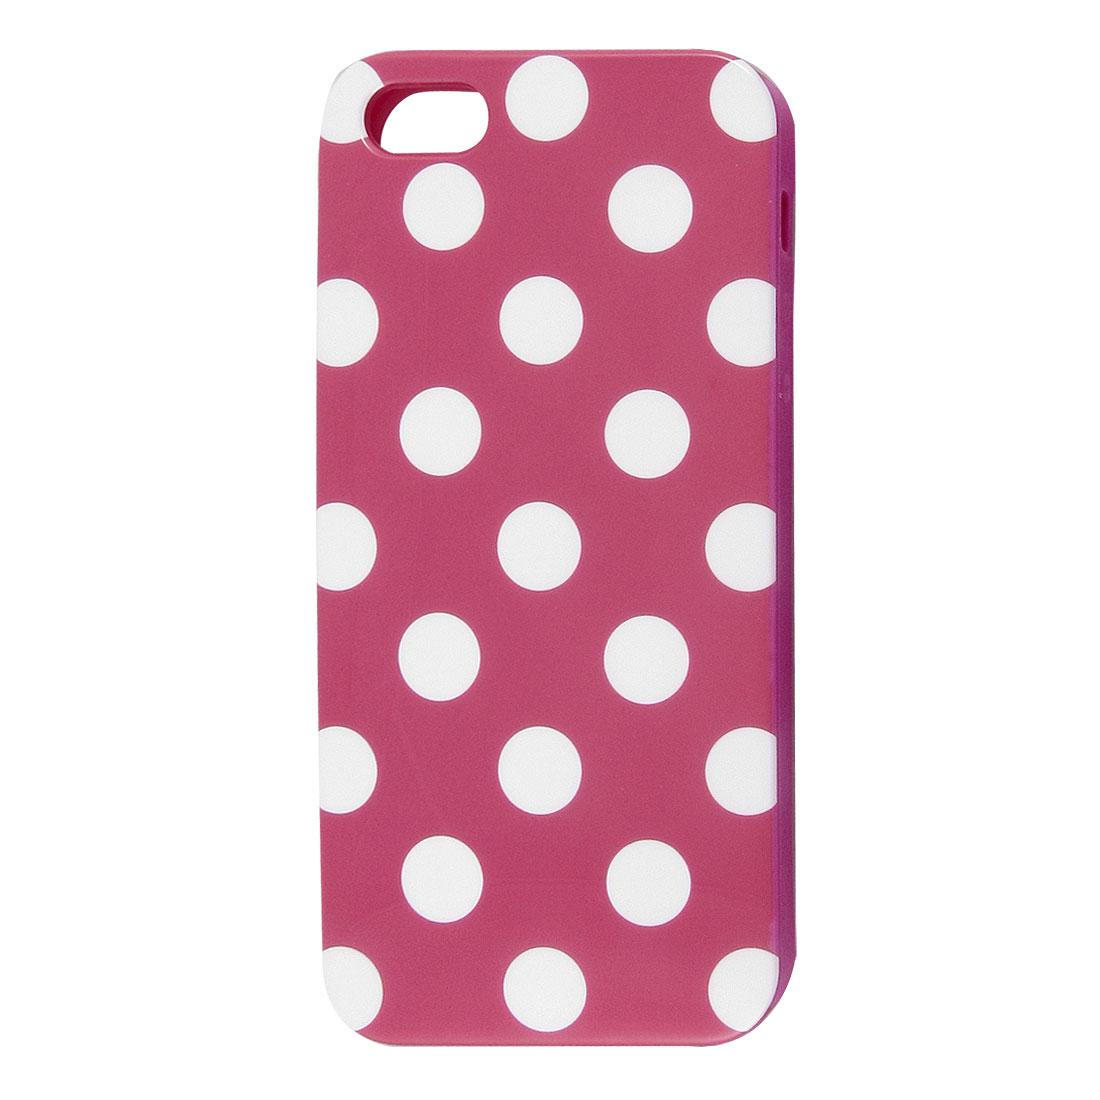 White Polka Dot Fuchsia Plastic TPU Phone Case Cover for Apple iPhone 5 5G